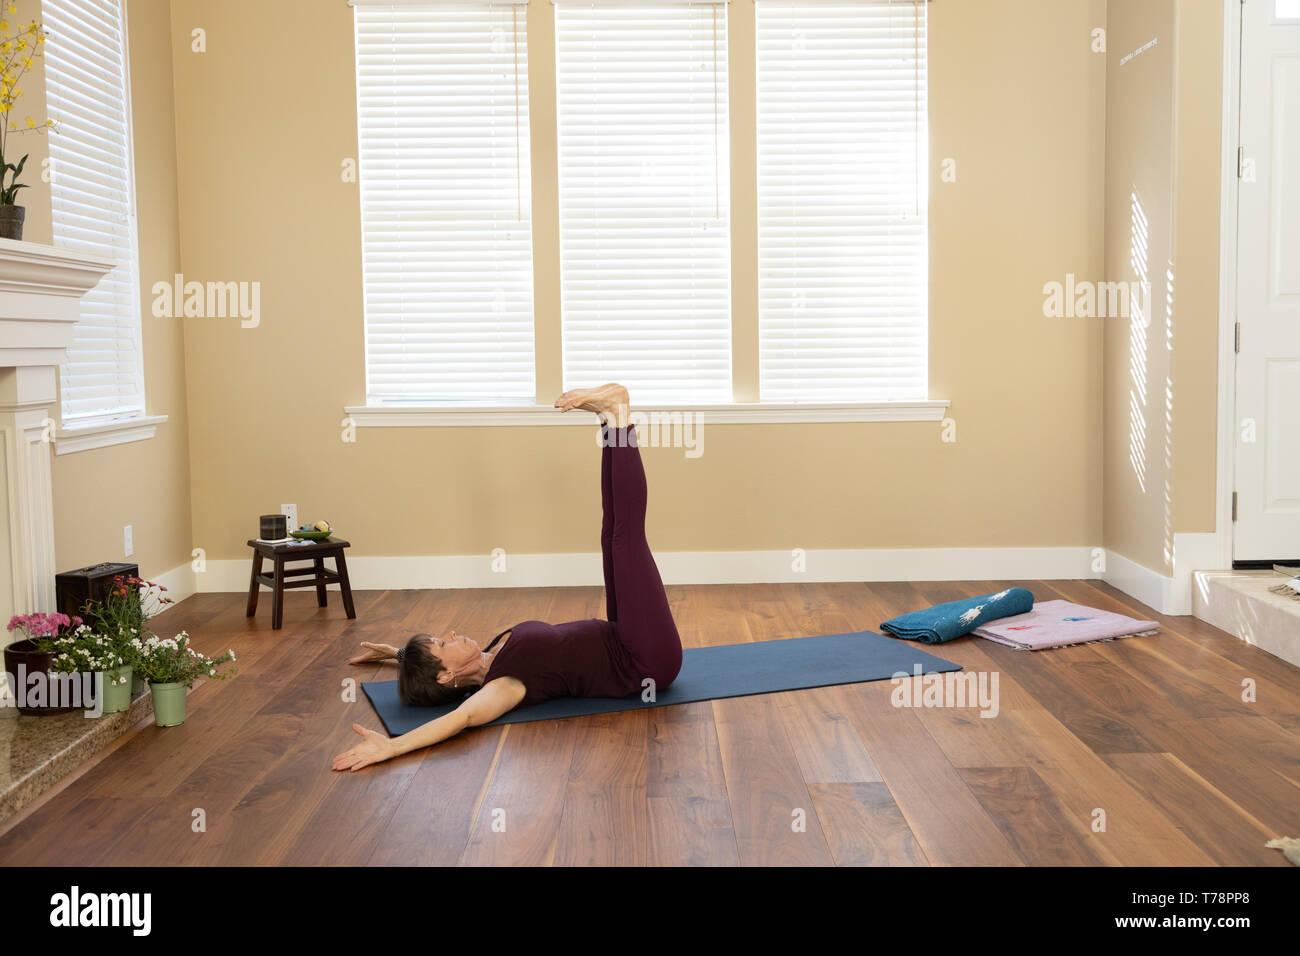 Yoga Urdhva Prasrta Padottanasana - Stock Image